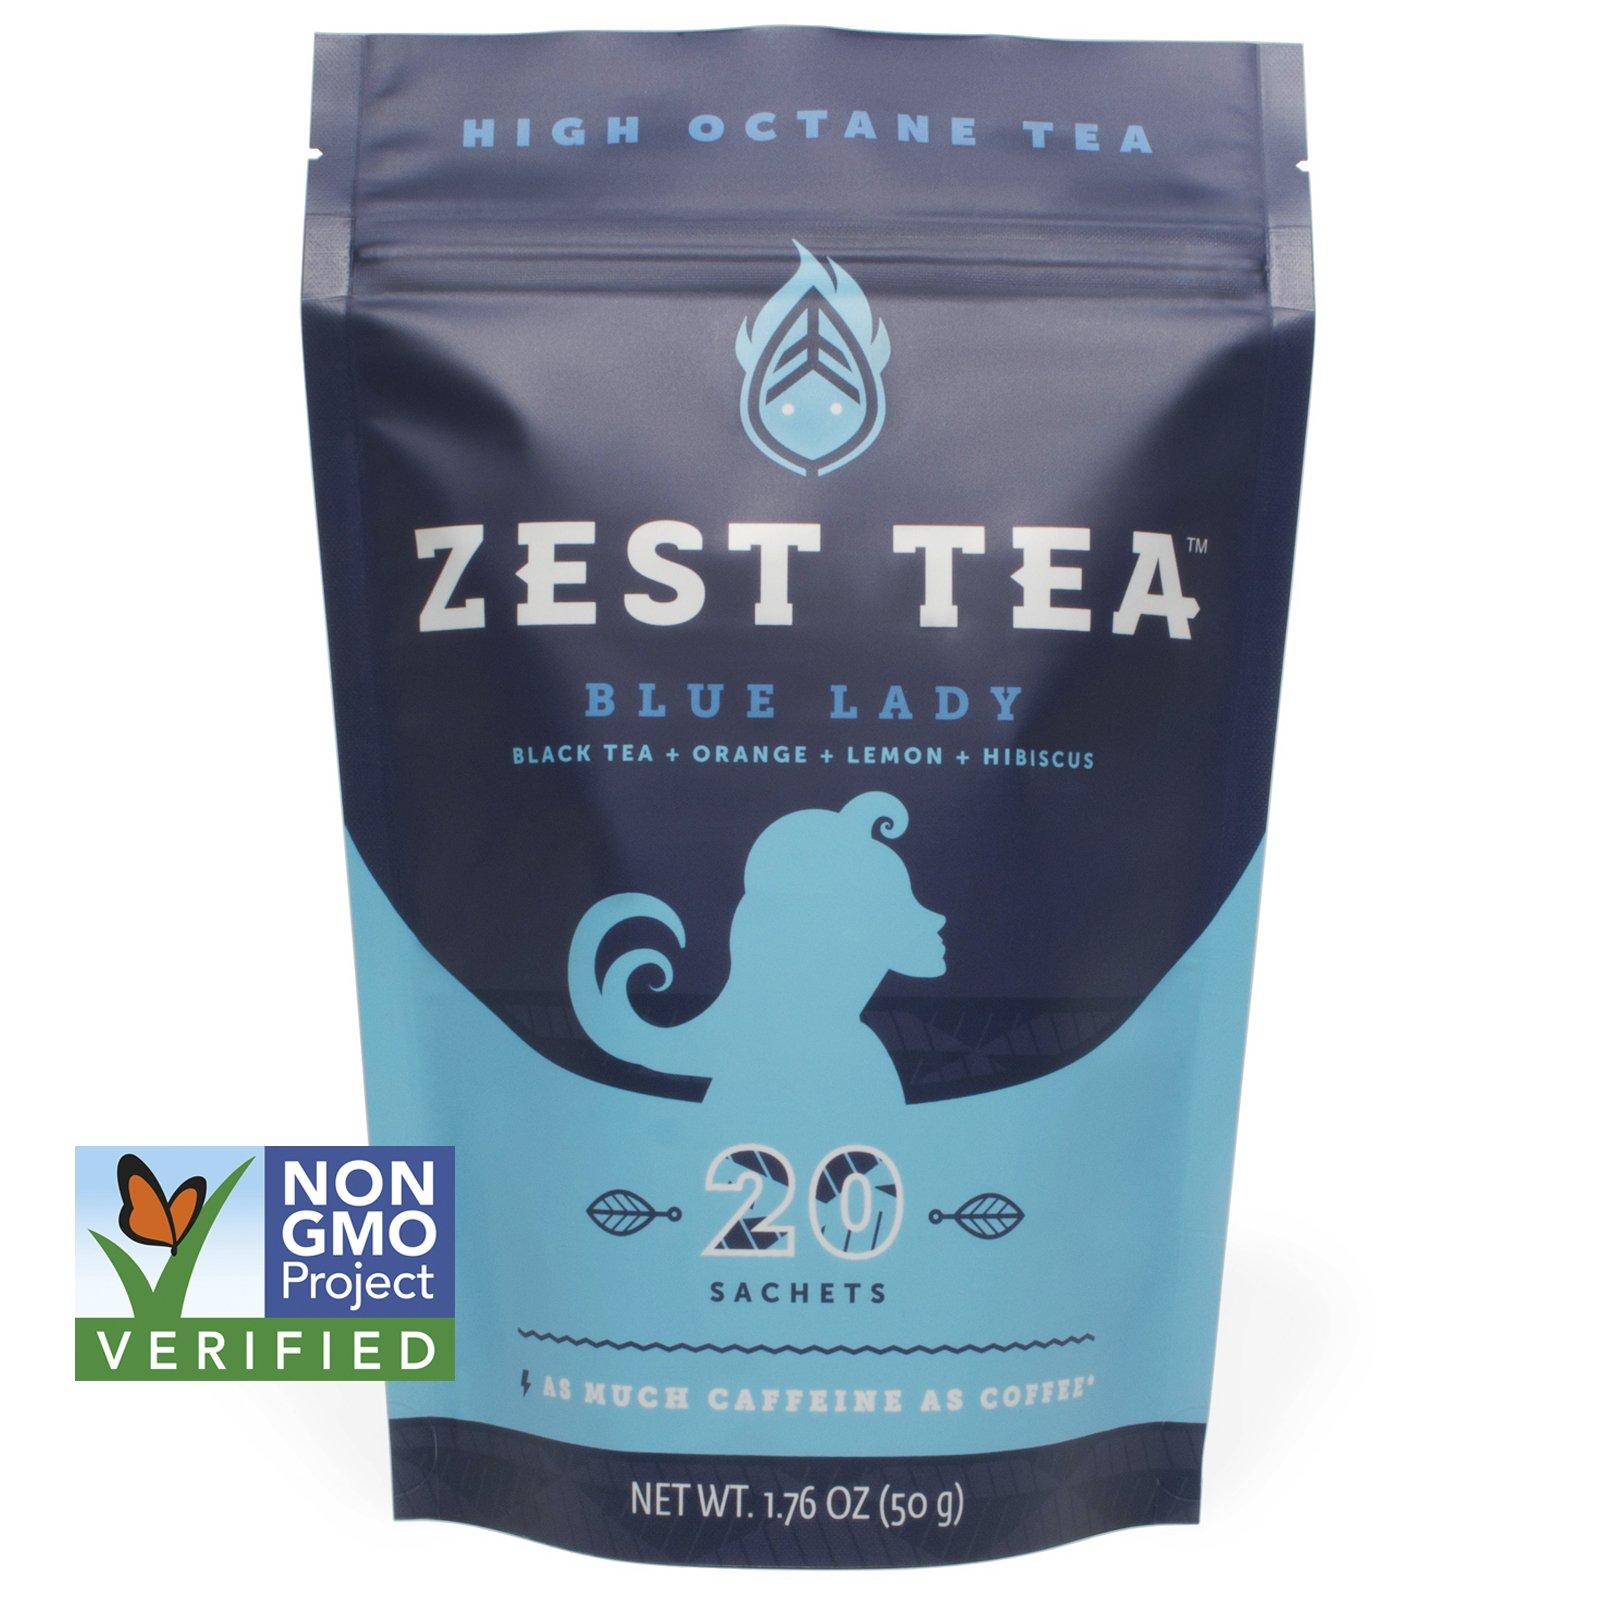 Blue Lady Black Energy Tea - High Caffeine Blend (3X Regular) - Healthy Coffee Substitute, Citrus and Hibiscus Flavor, 20 Sachet Package (50 Grams) by Zest Tea (Image #1)